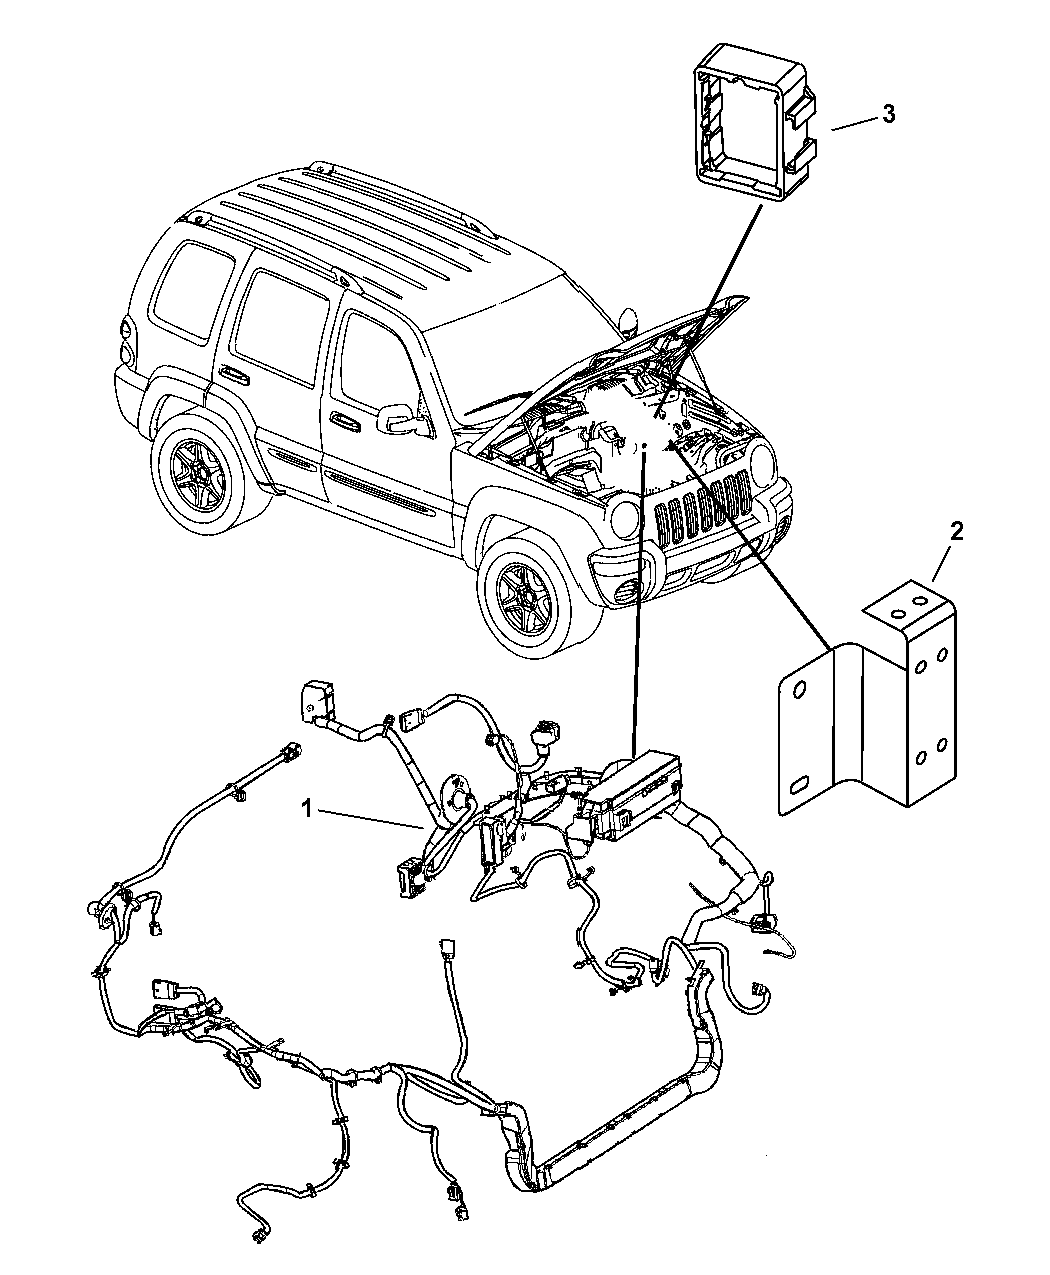 2005 Jeep Liberty Wiring - Headlamp To Dash